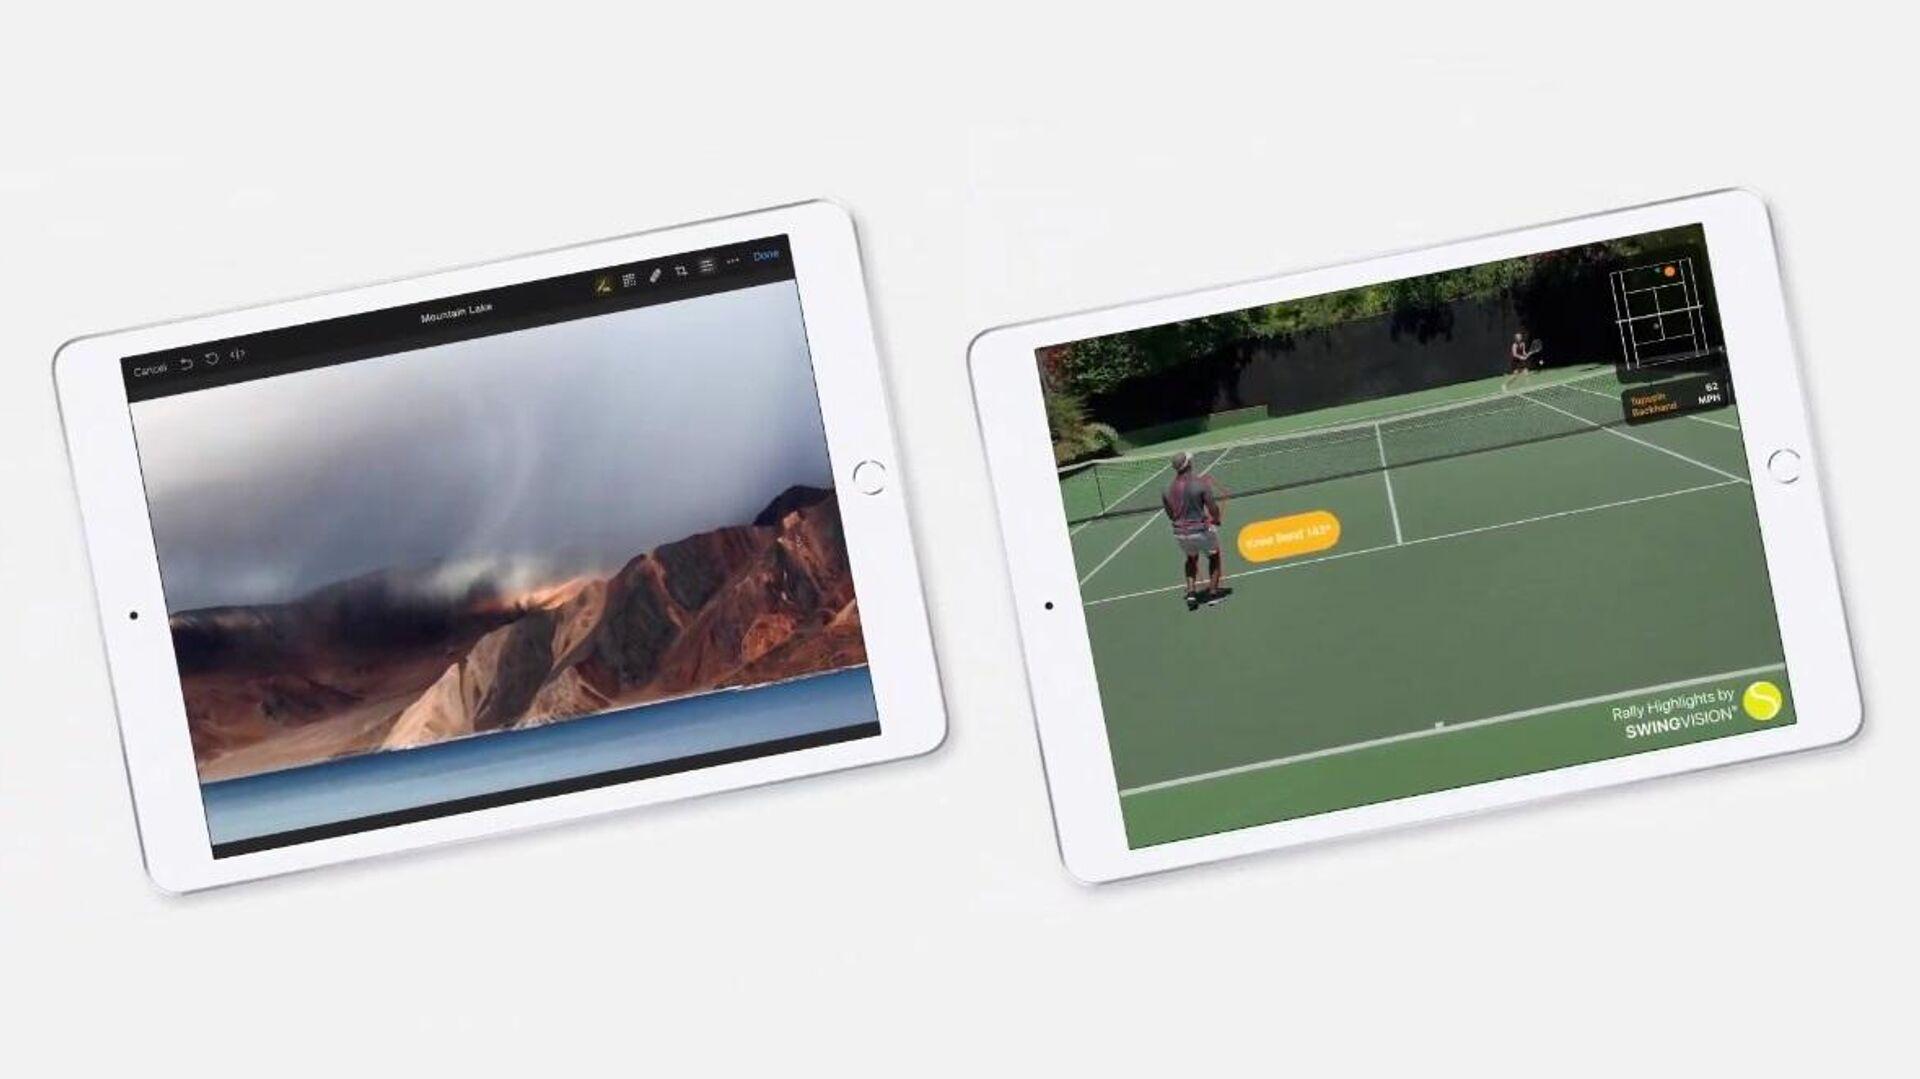 Apple iPad 2020 - РИА Новости, 1920, 15.09.2020